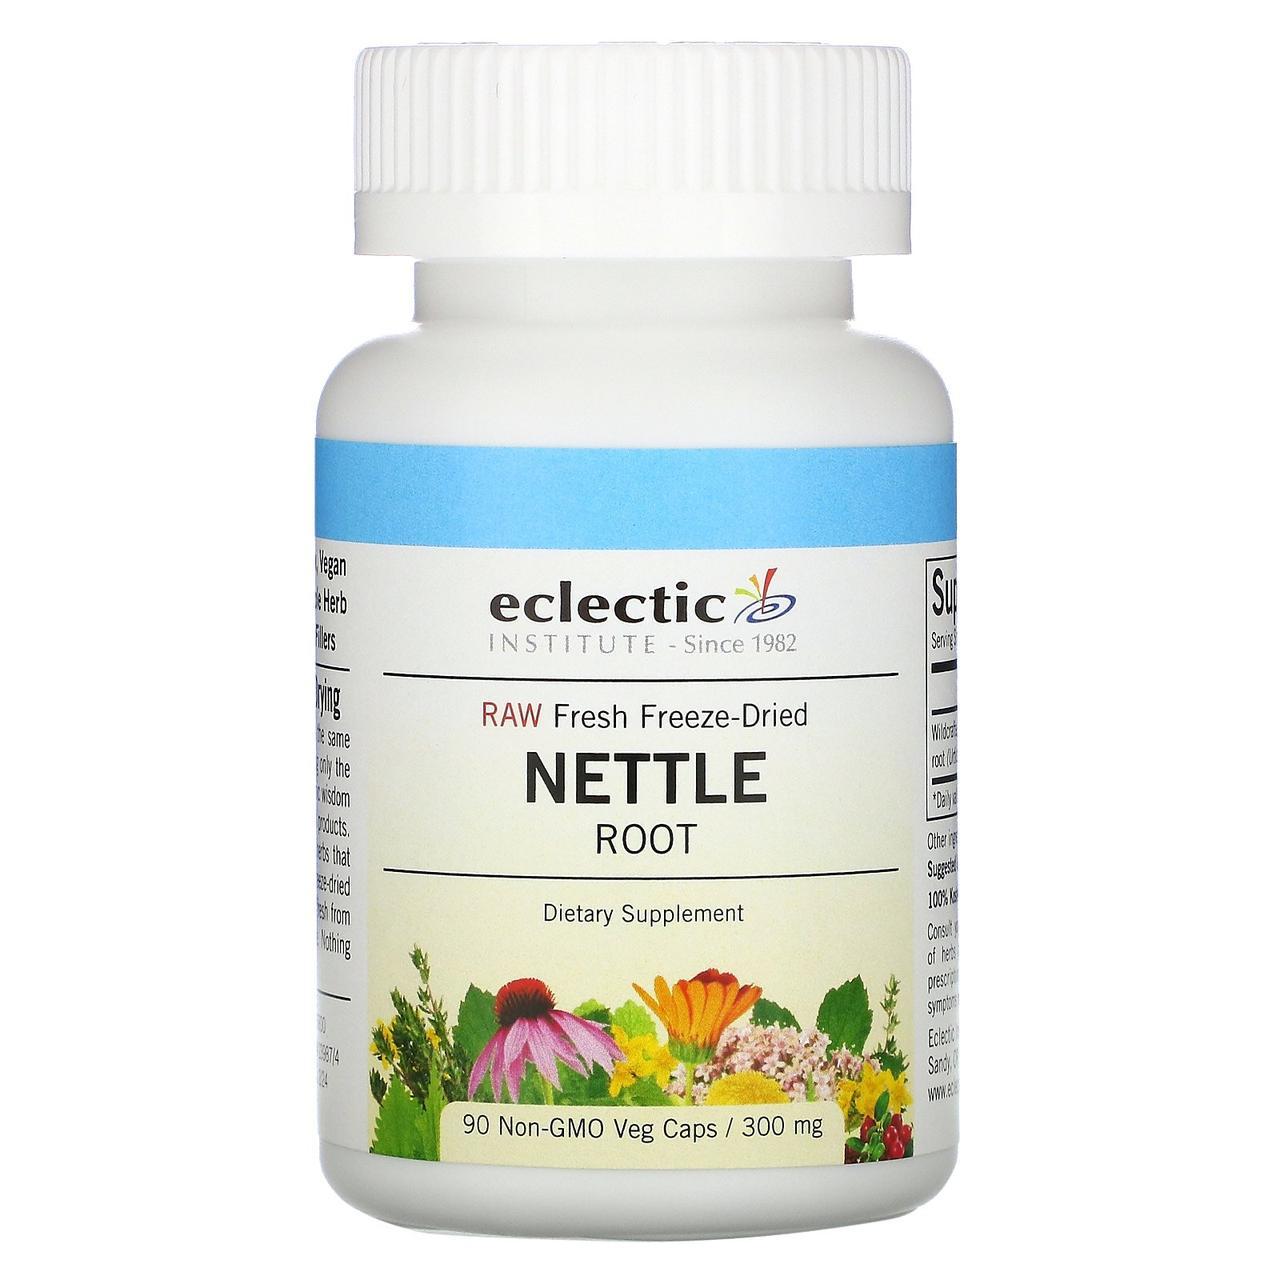 Крапива корень (Nettle Root), Eclectic Institute, 250 мг, 90 кап.